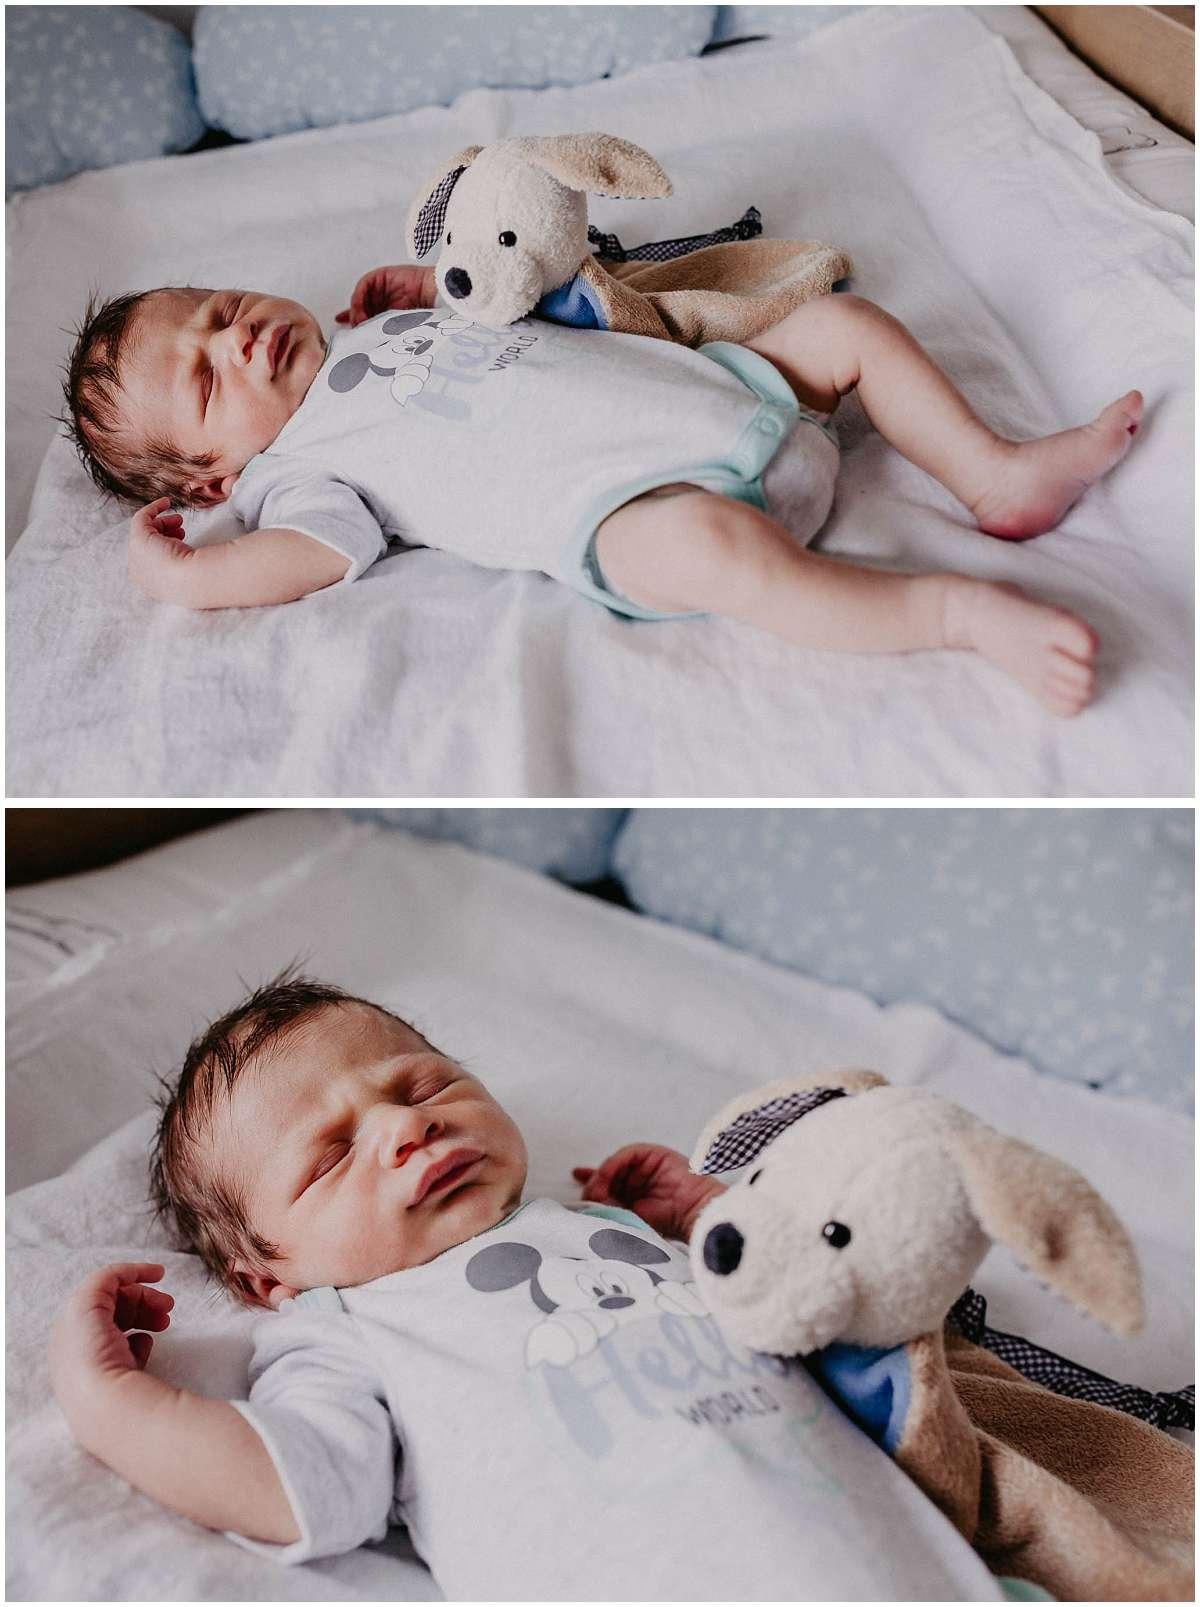 Neugeborenenreportage als Homestory in Bochum